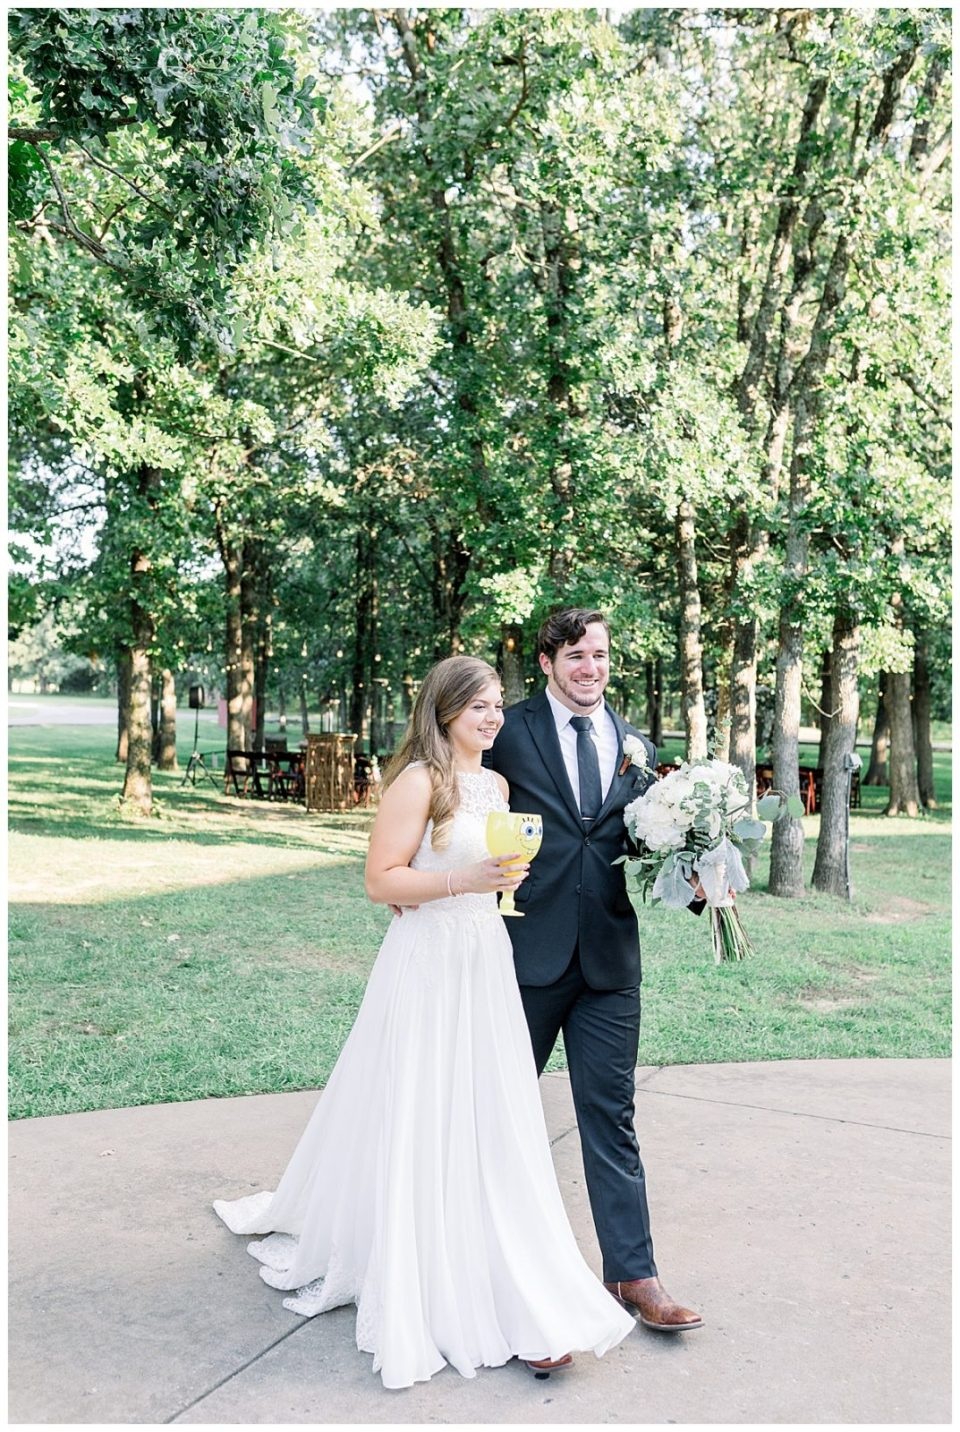 Bride and groom headed to wedding reception at PostOak Lodge in Tulsa, OK  Tulsa Wedding Photographer  PostOak Lodge Wedding  Destination Wedding Photographer  Andi Bravo Photography